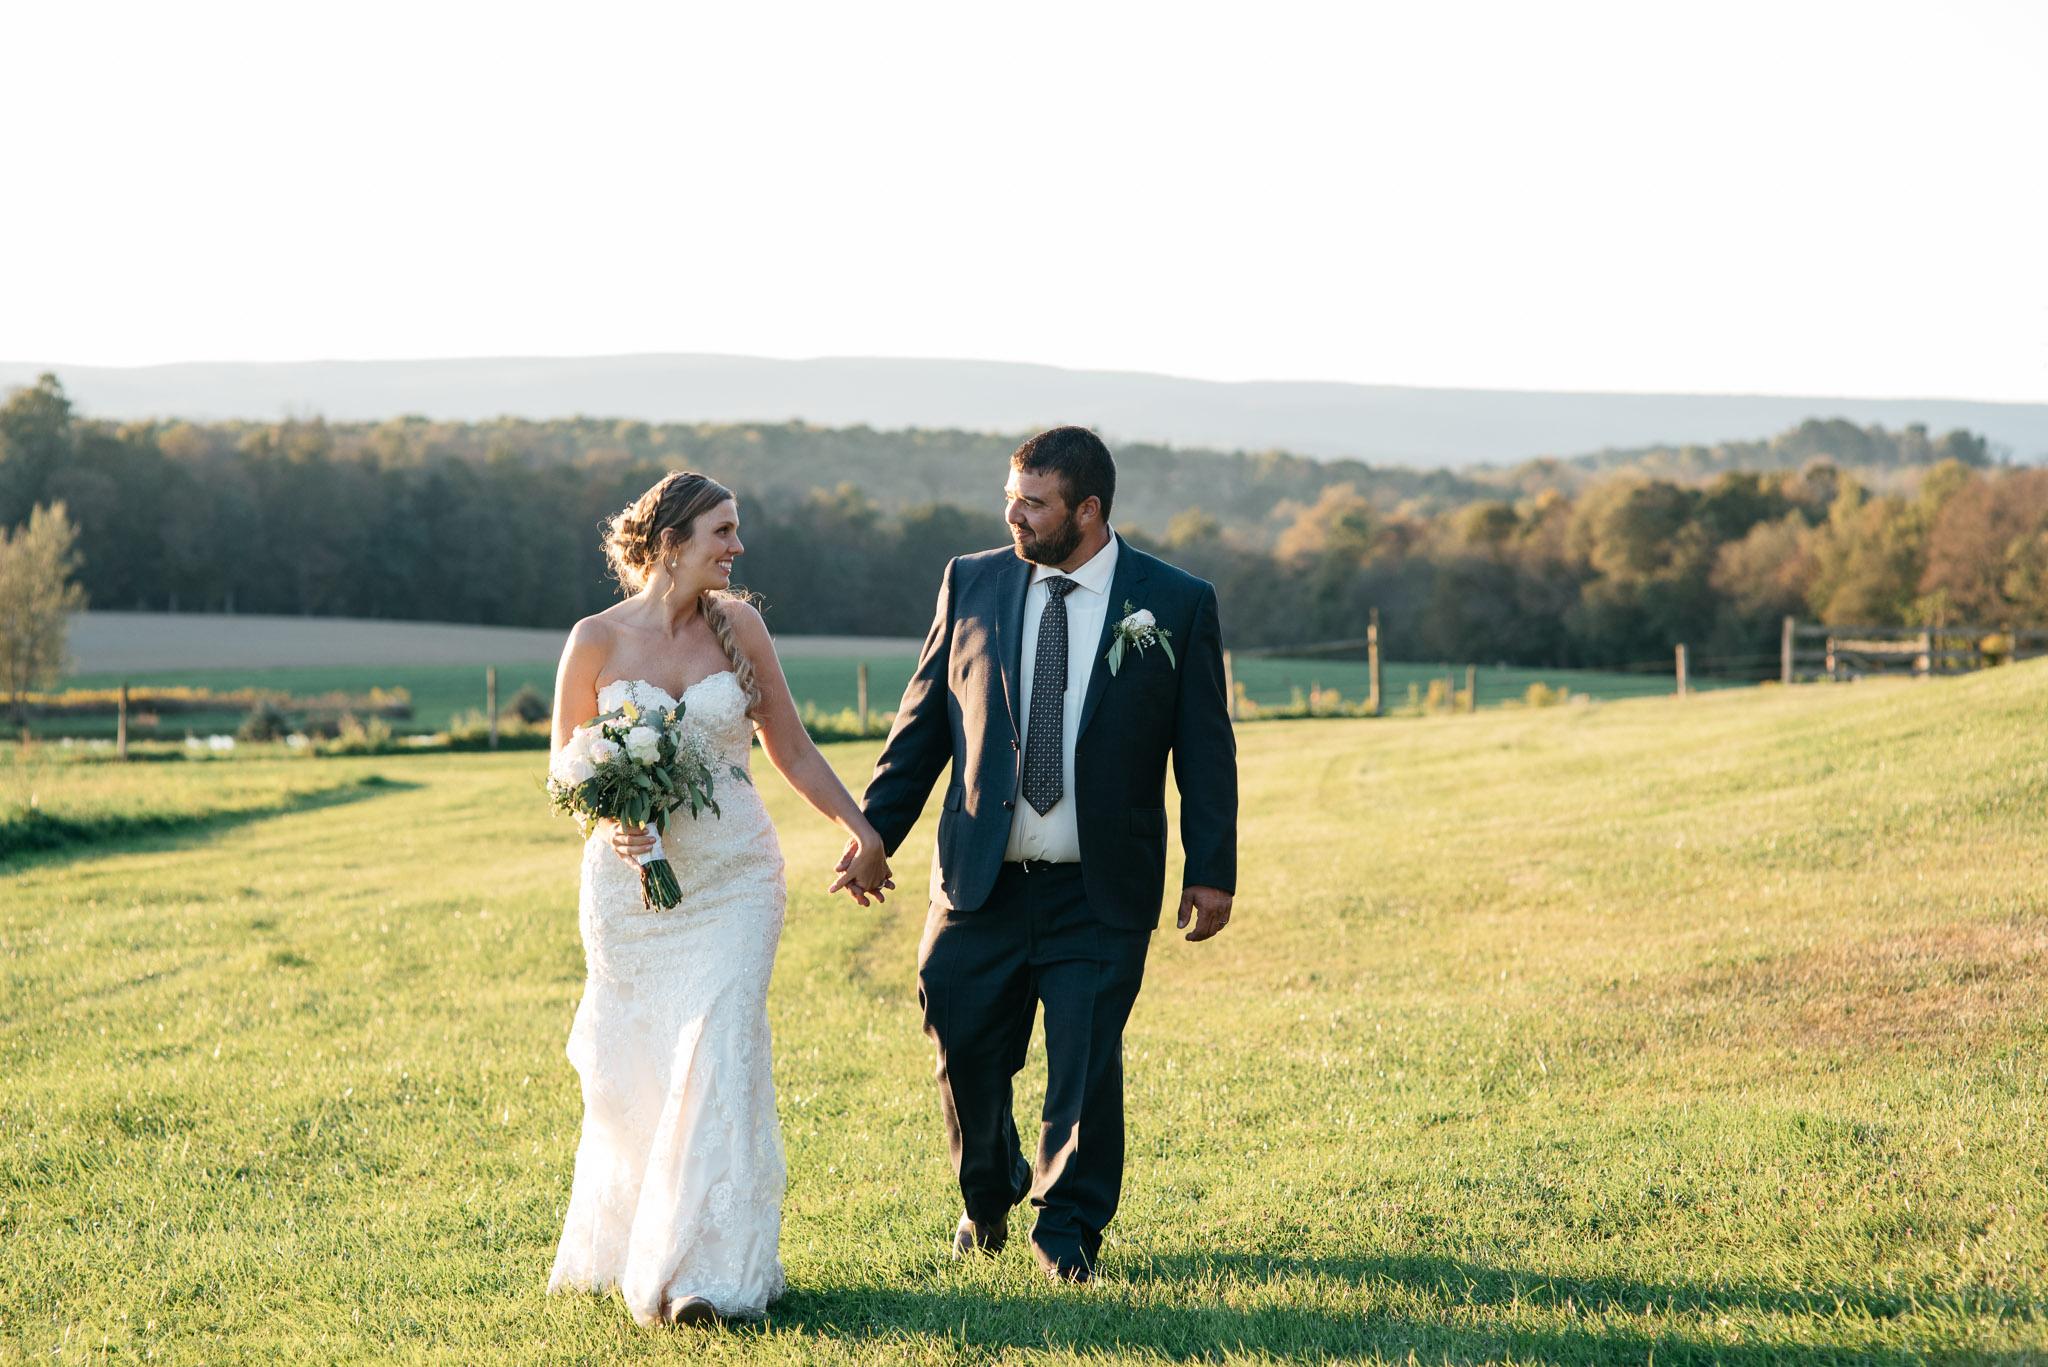 pittsburgh-ligonier-wedding-photographer-the-event-barn-at-highland-farms-46.jpg